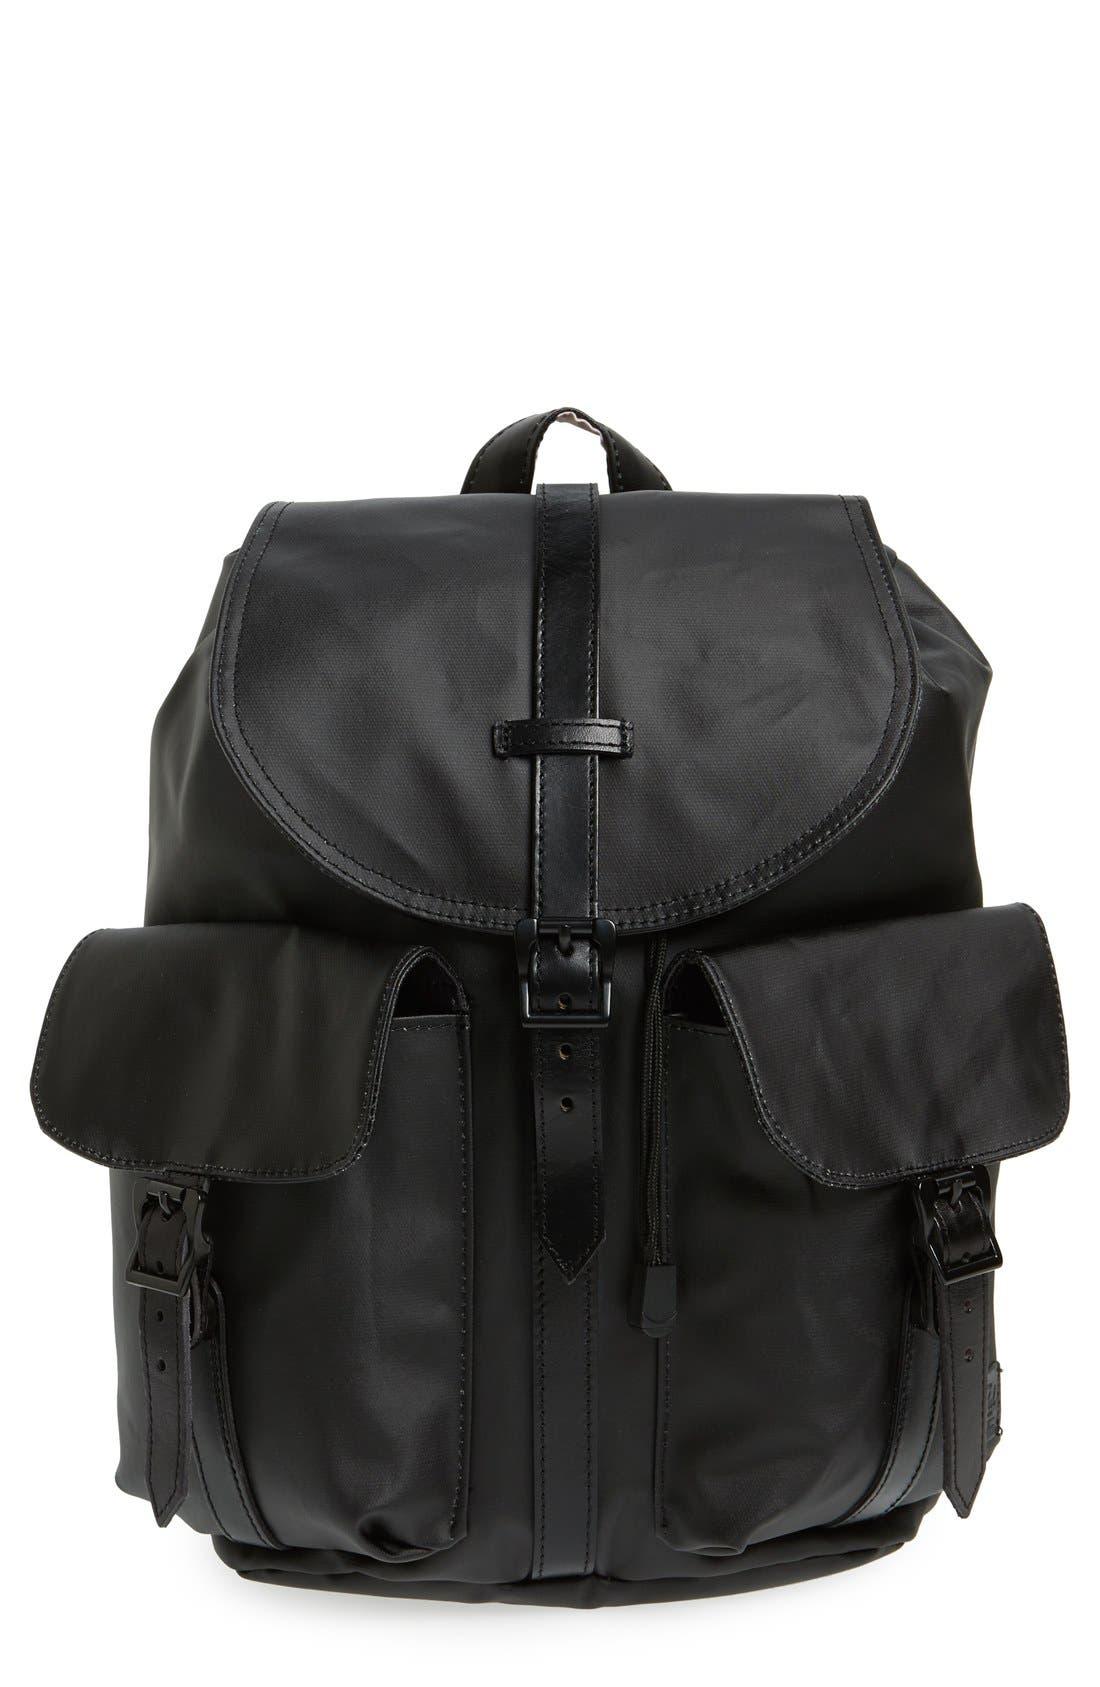 Alternate Image 1 Selected - Herschel Supply Co. 'Dawson' Backpack